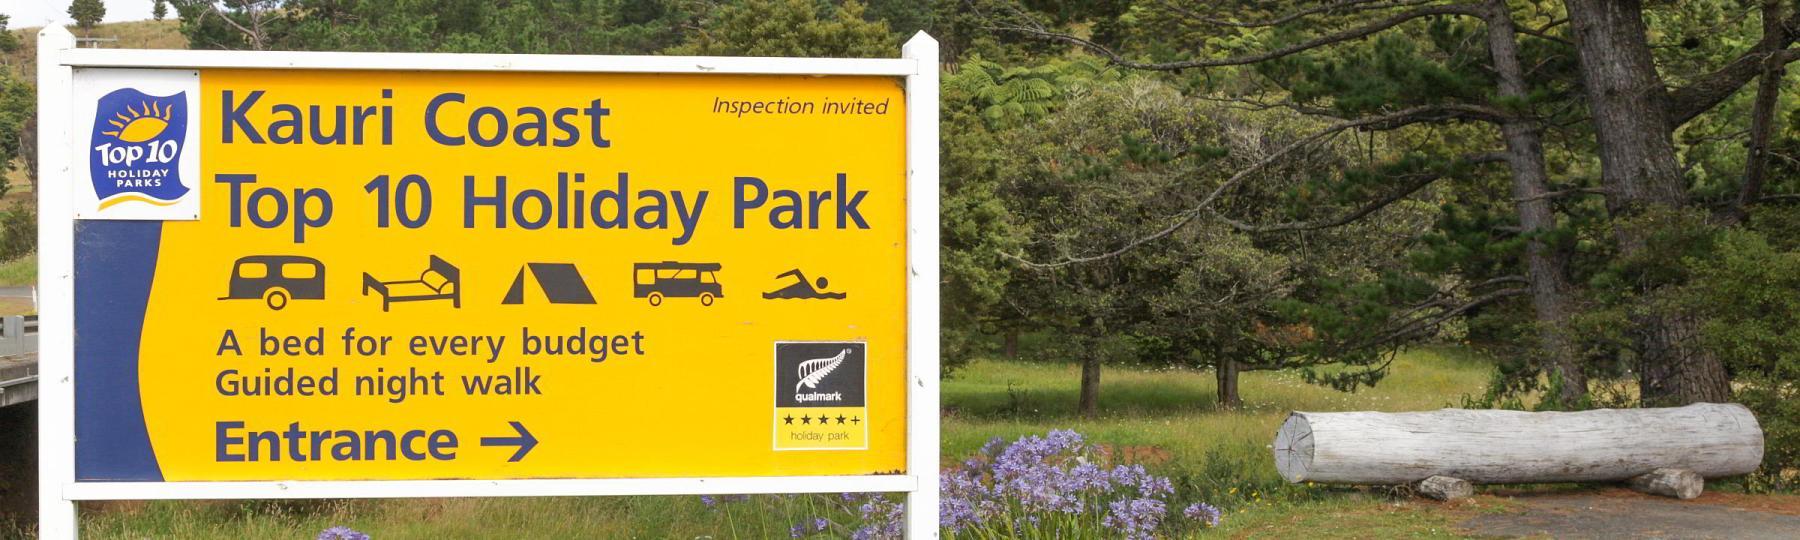 Schild zum Campingplatz Kauri Coast